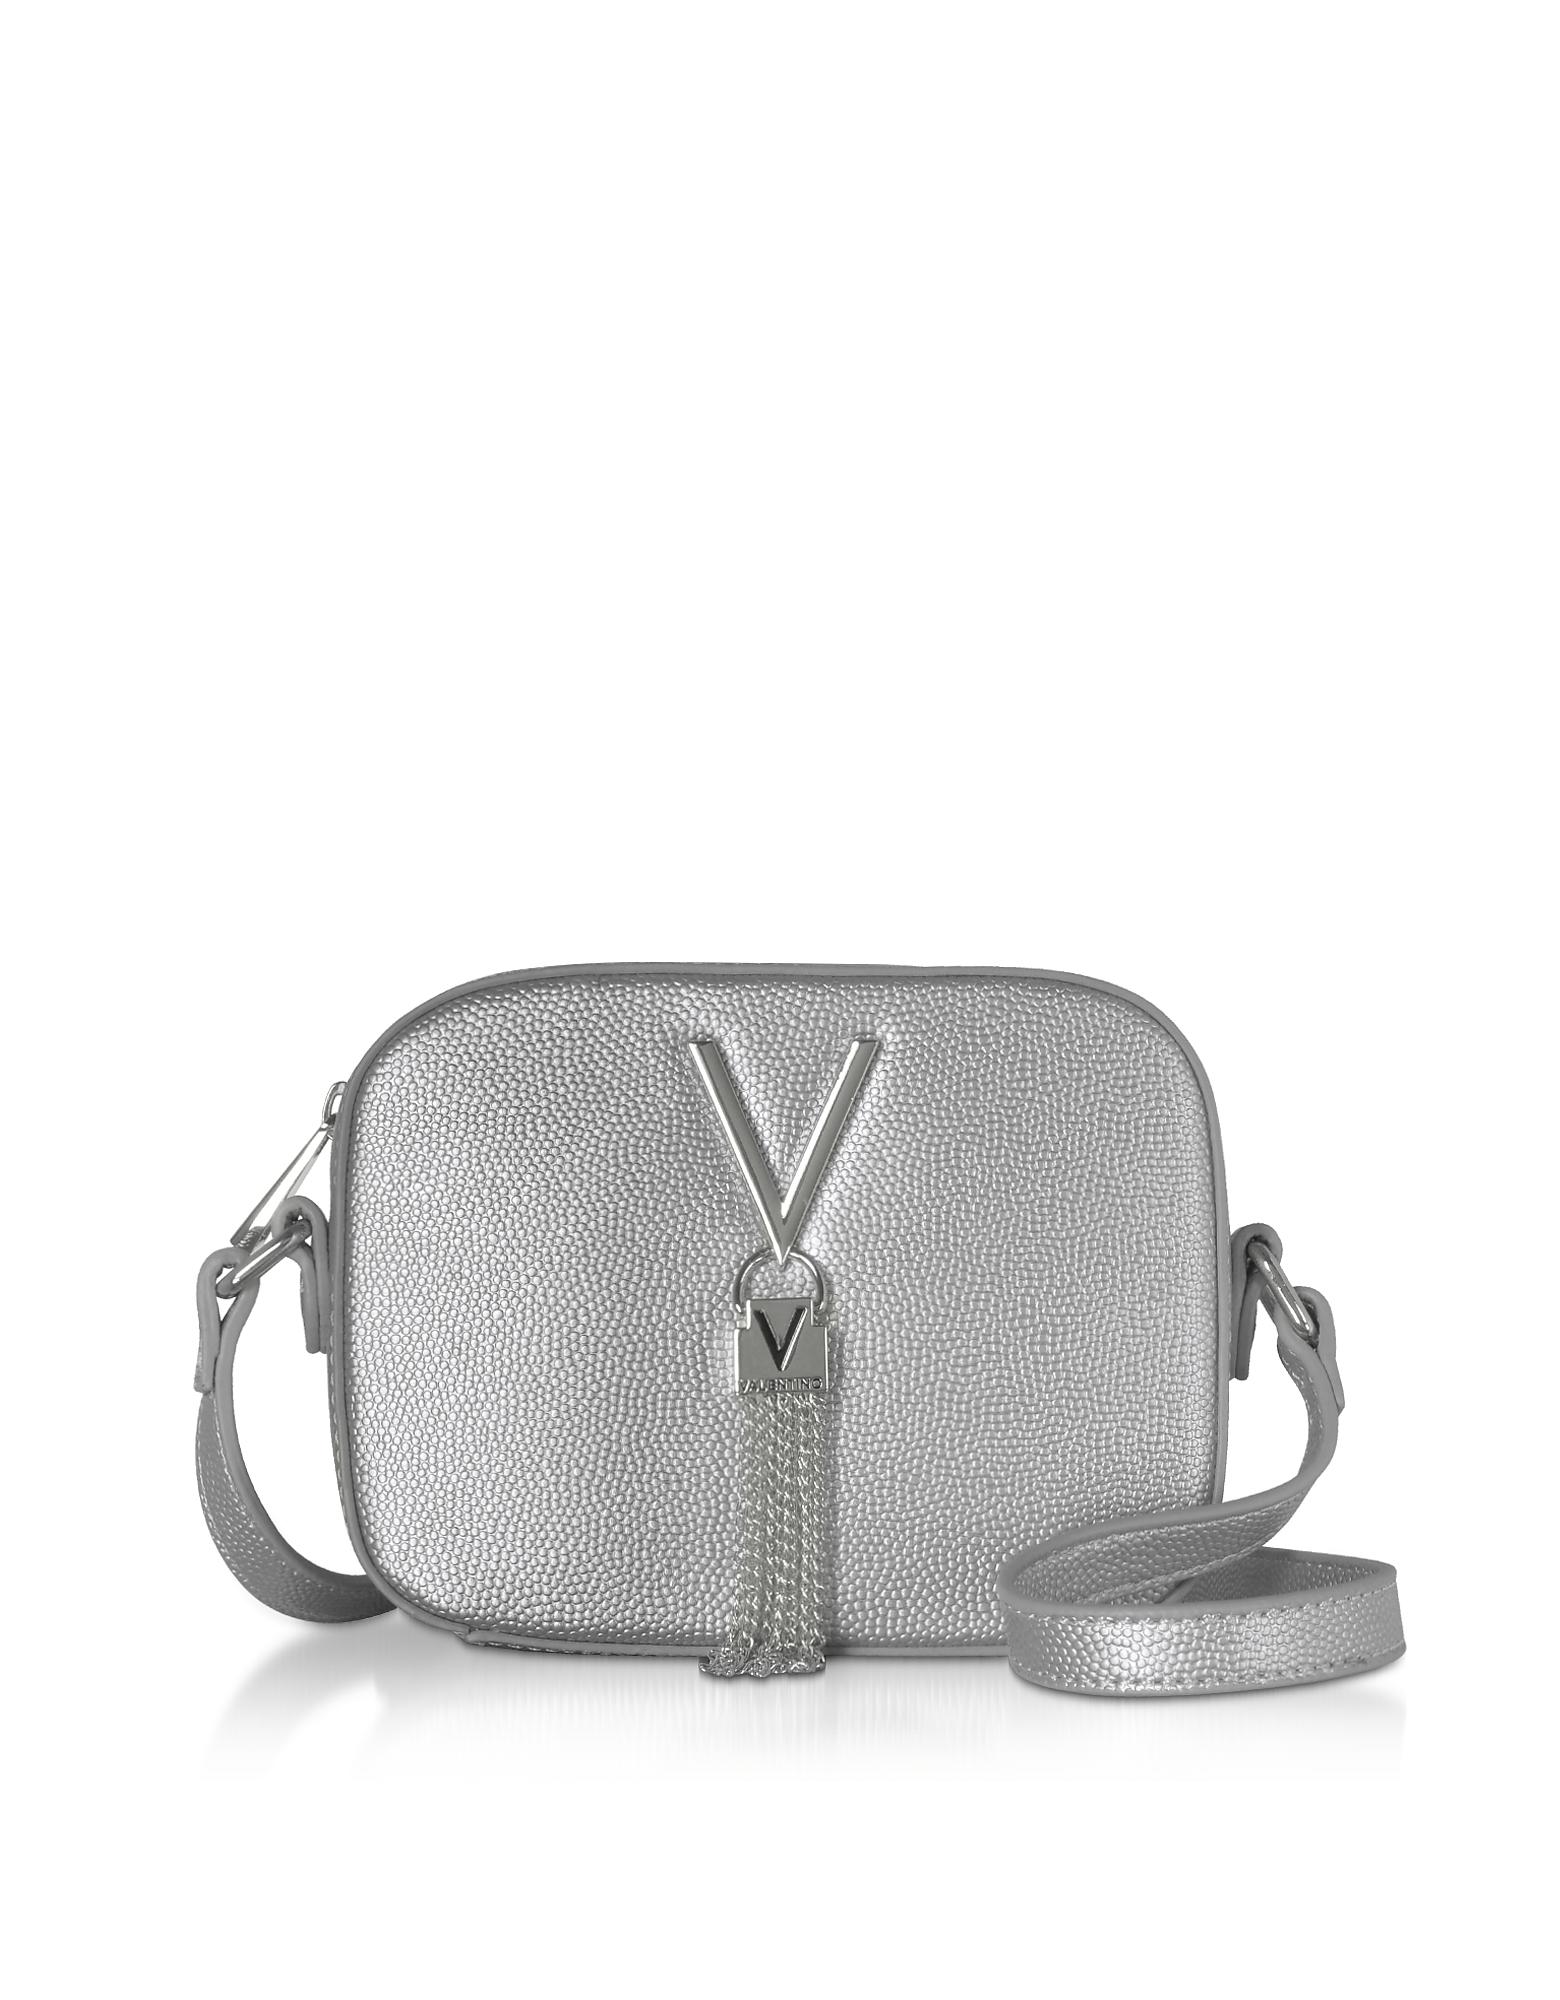 Valentino by Mario Valentino Designer Handbags, Gold Lizard Embossed Eco Leather Divina Mini Crossbody Bag